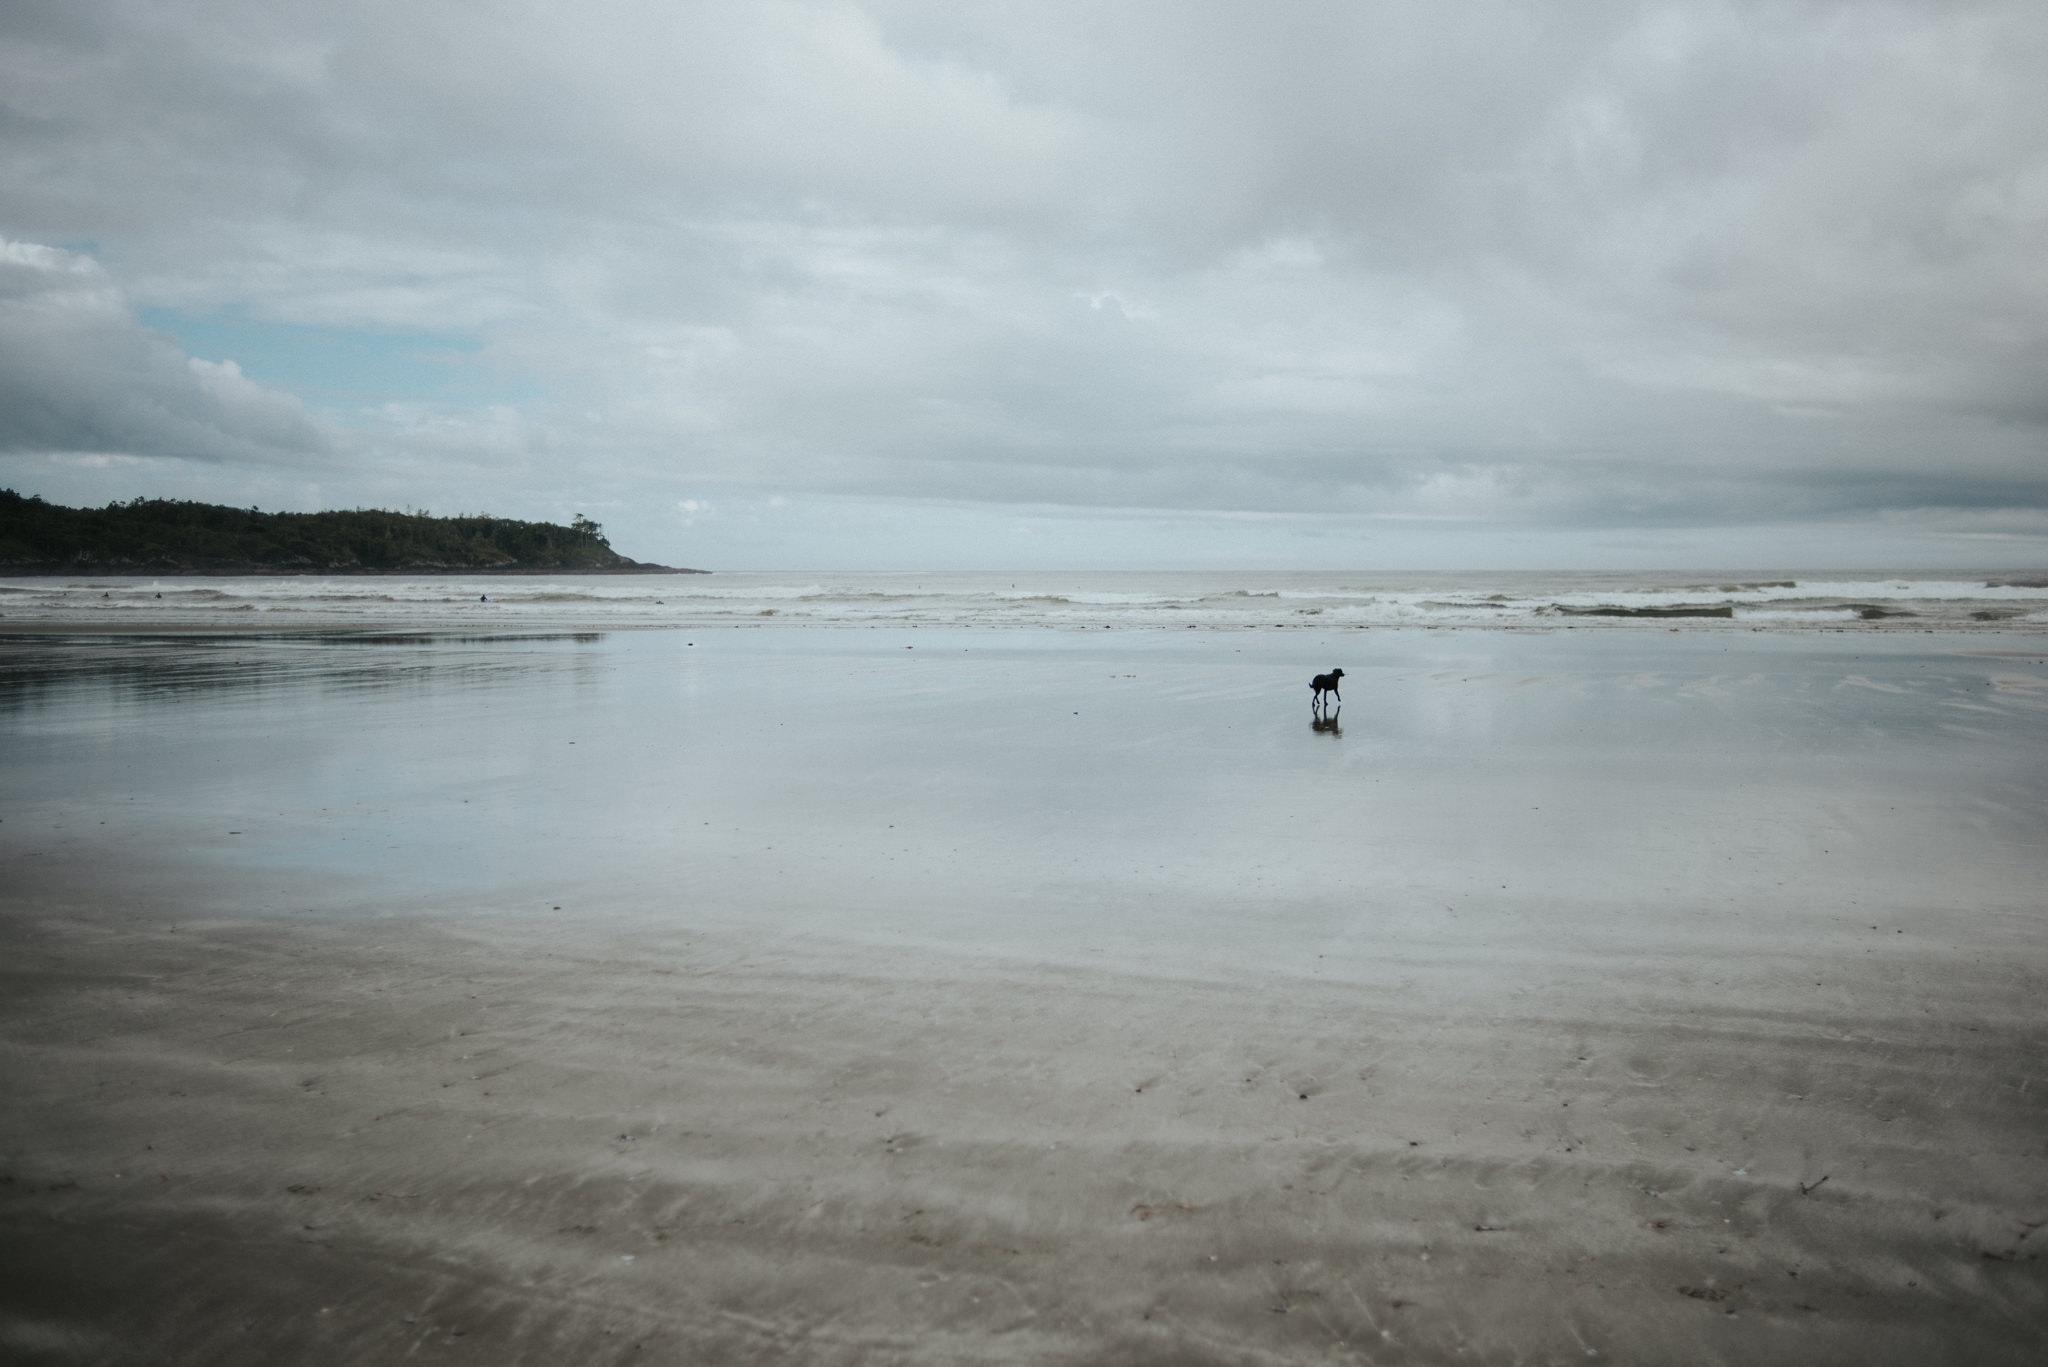 Cox Bay surfing in Tofino // Daring Wanderer: www.daringwanderer.com